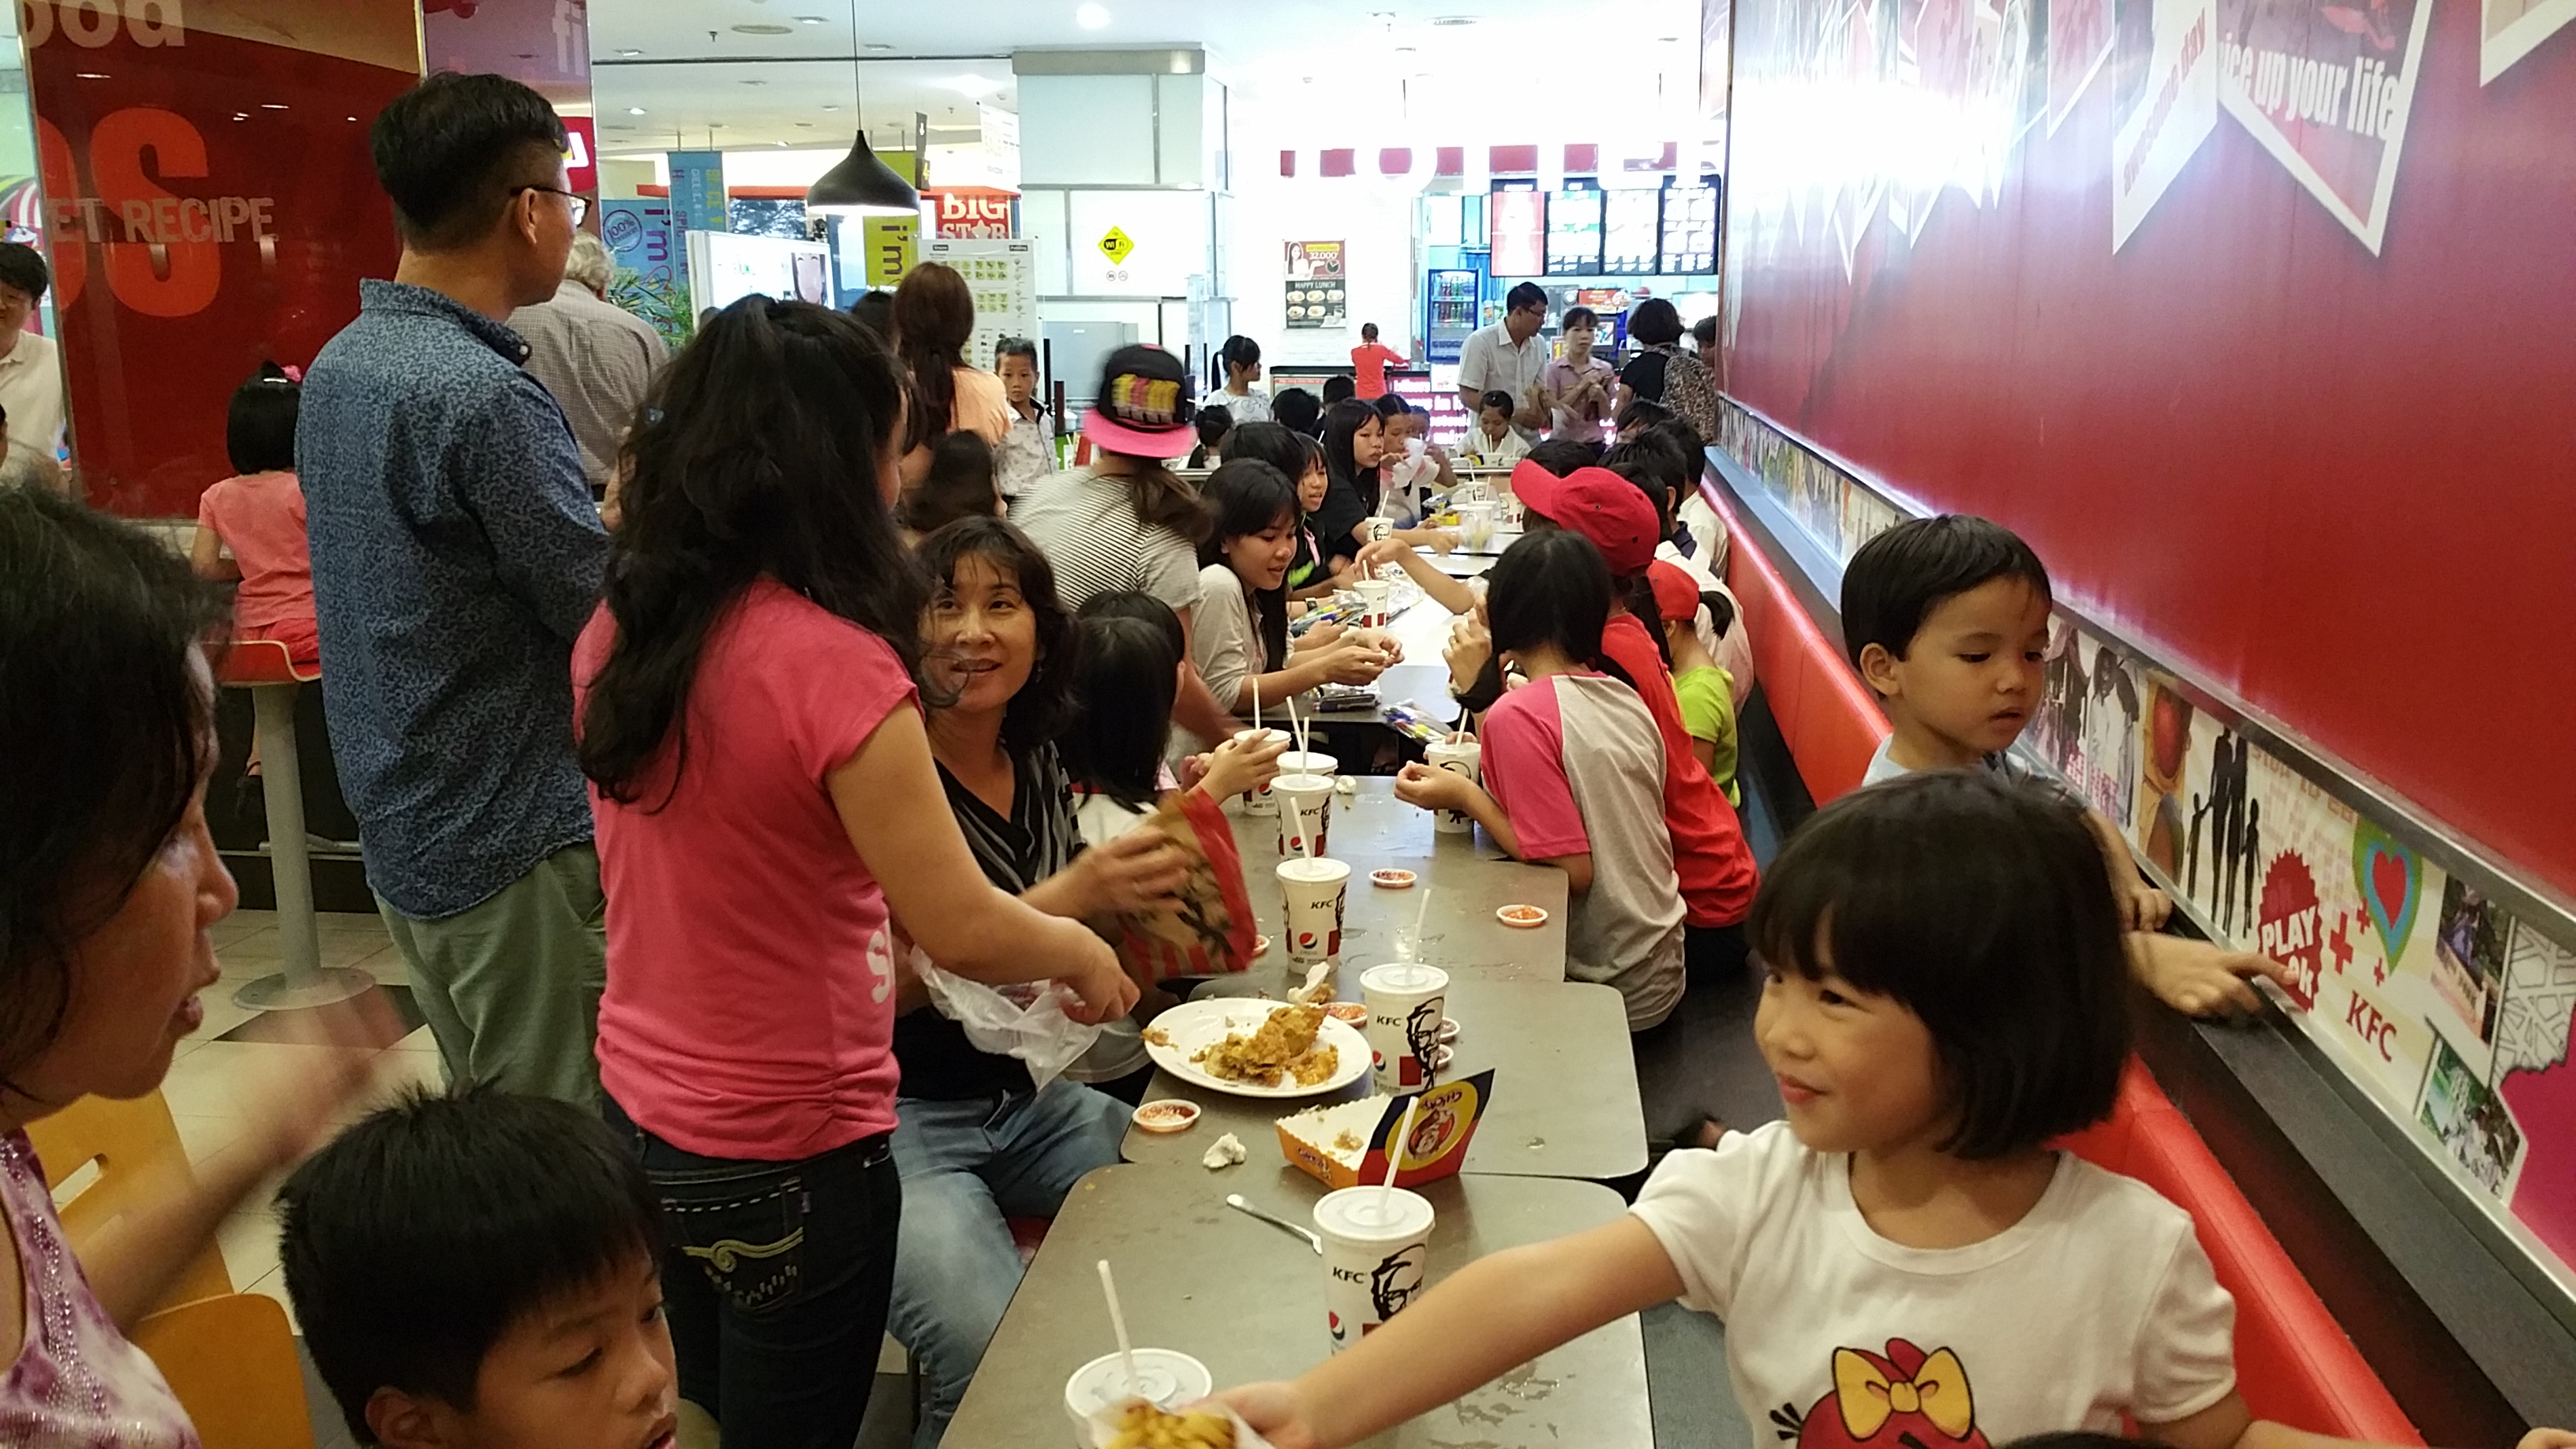 Fuuunday at KFC & the arcade